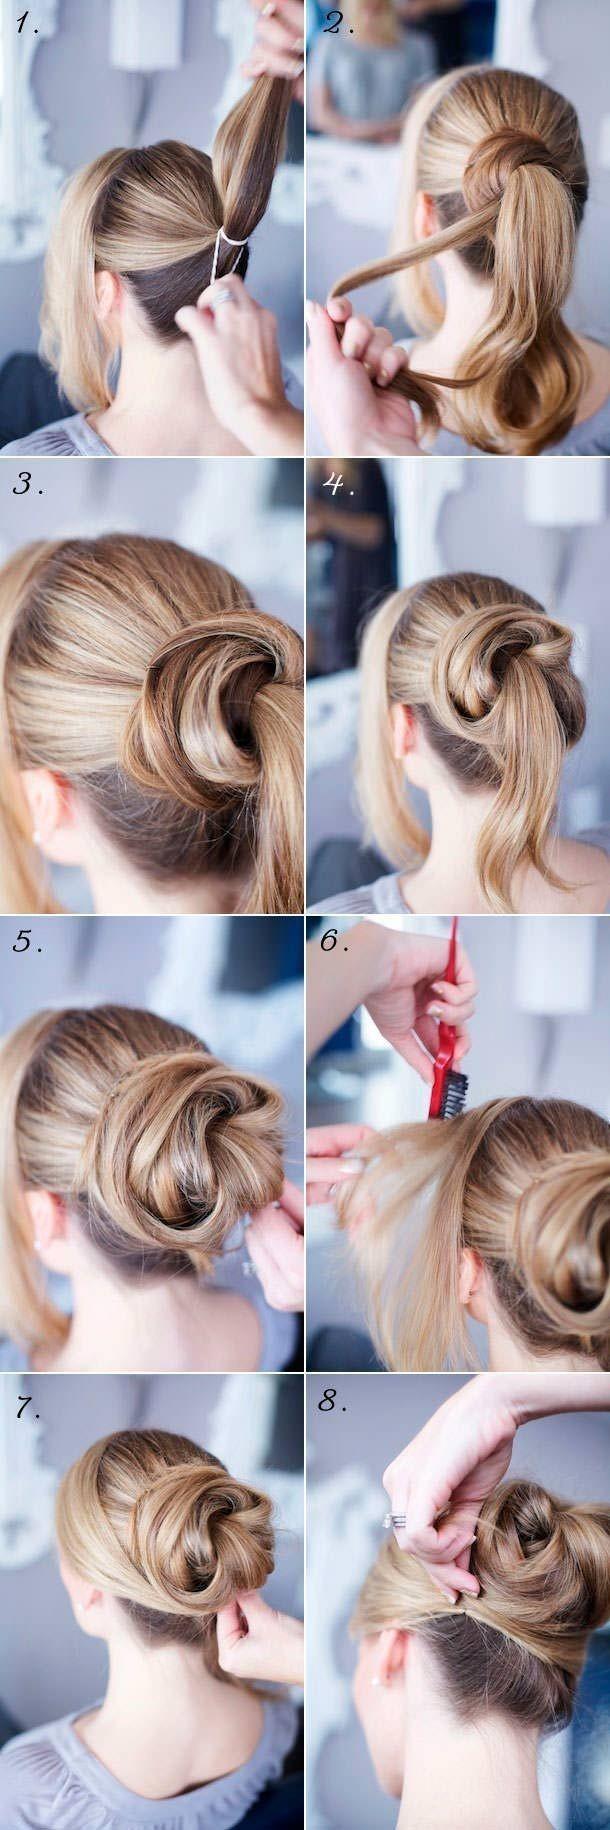 12 trendy low bun updo hairstyles tutorials: easy cute - popular